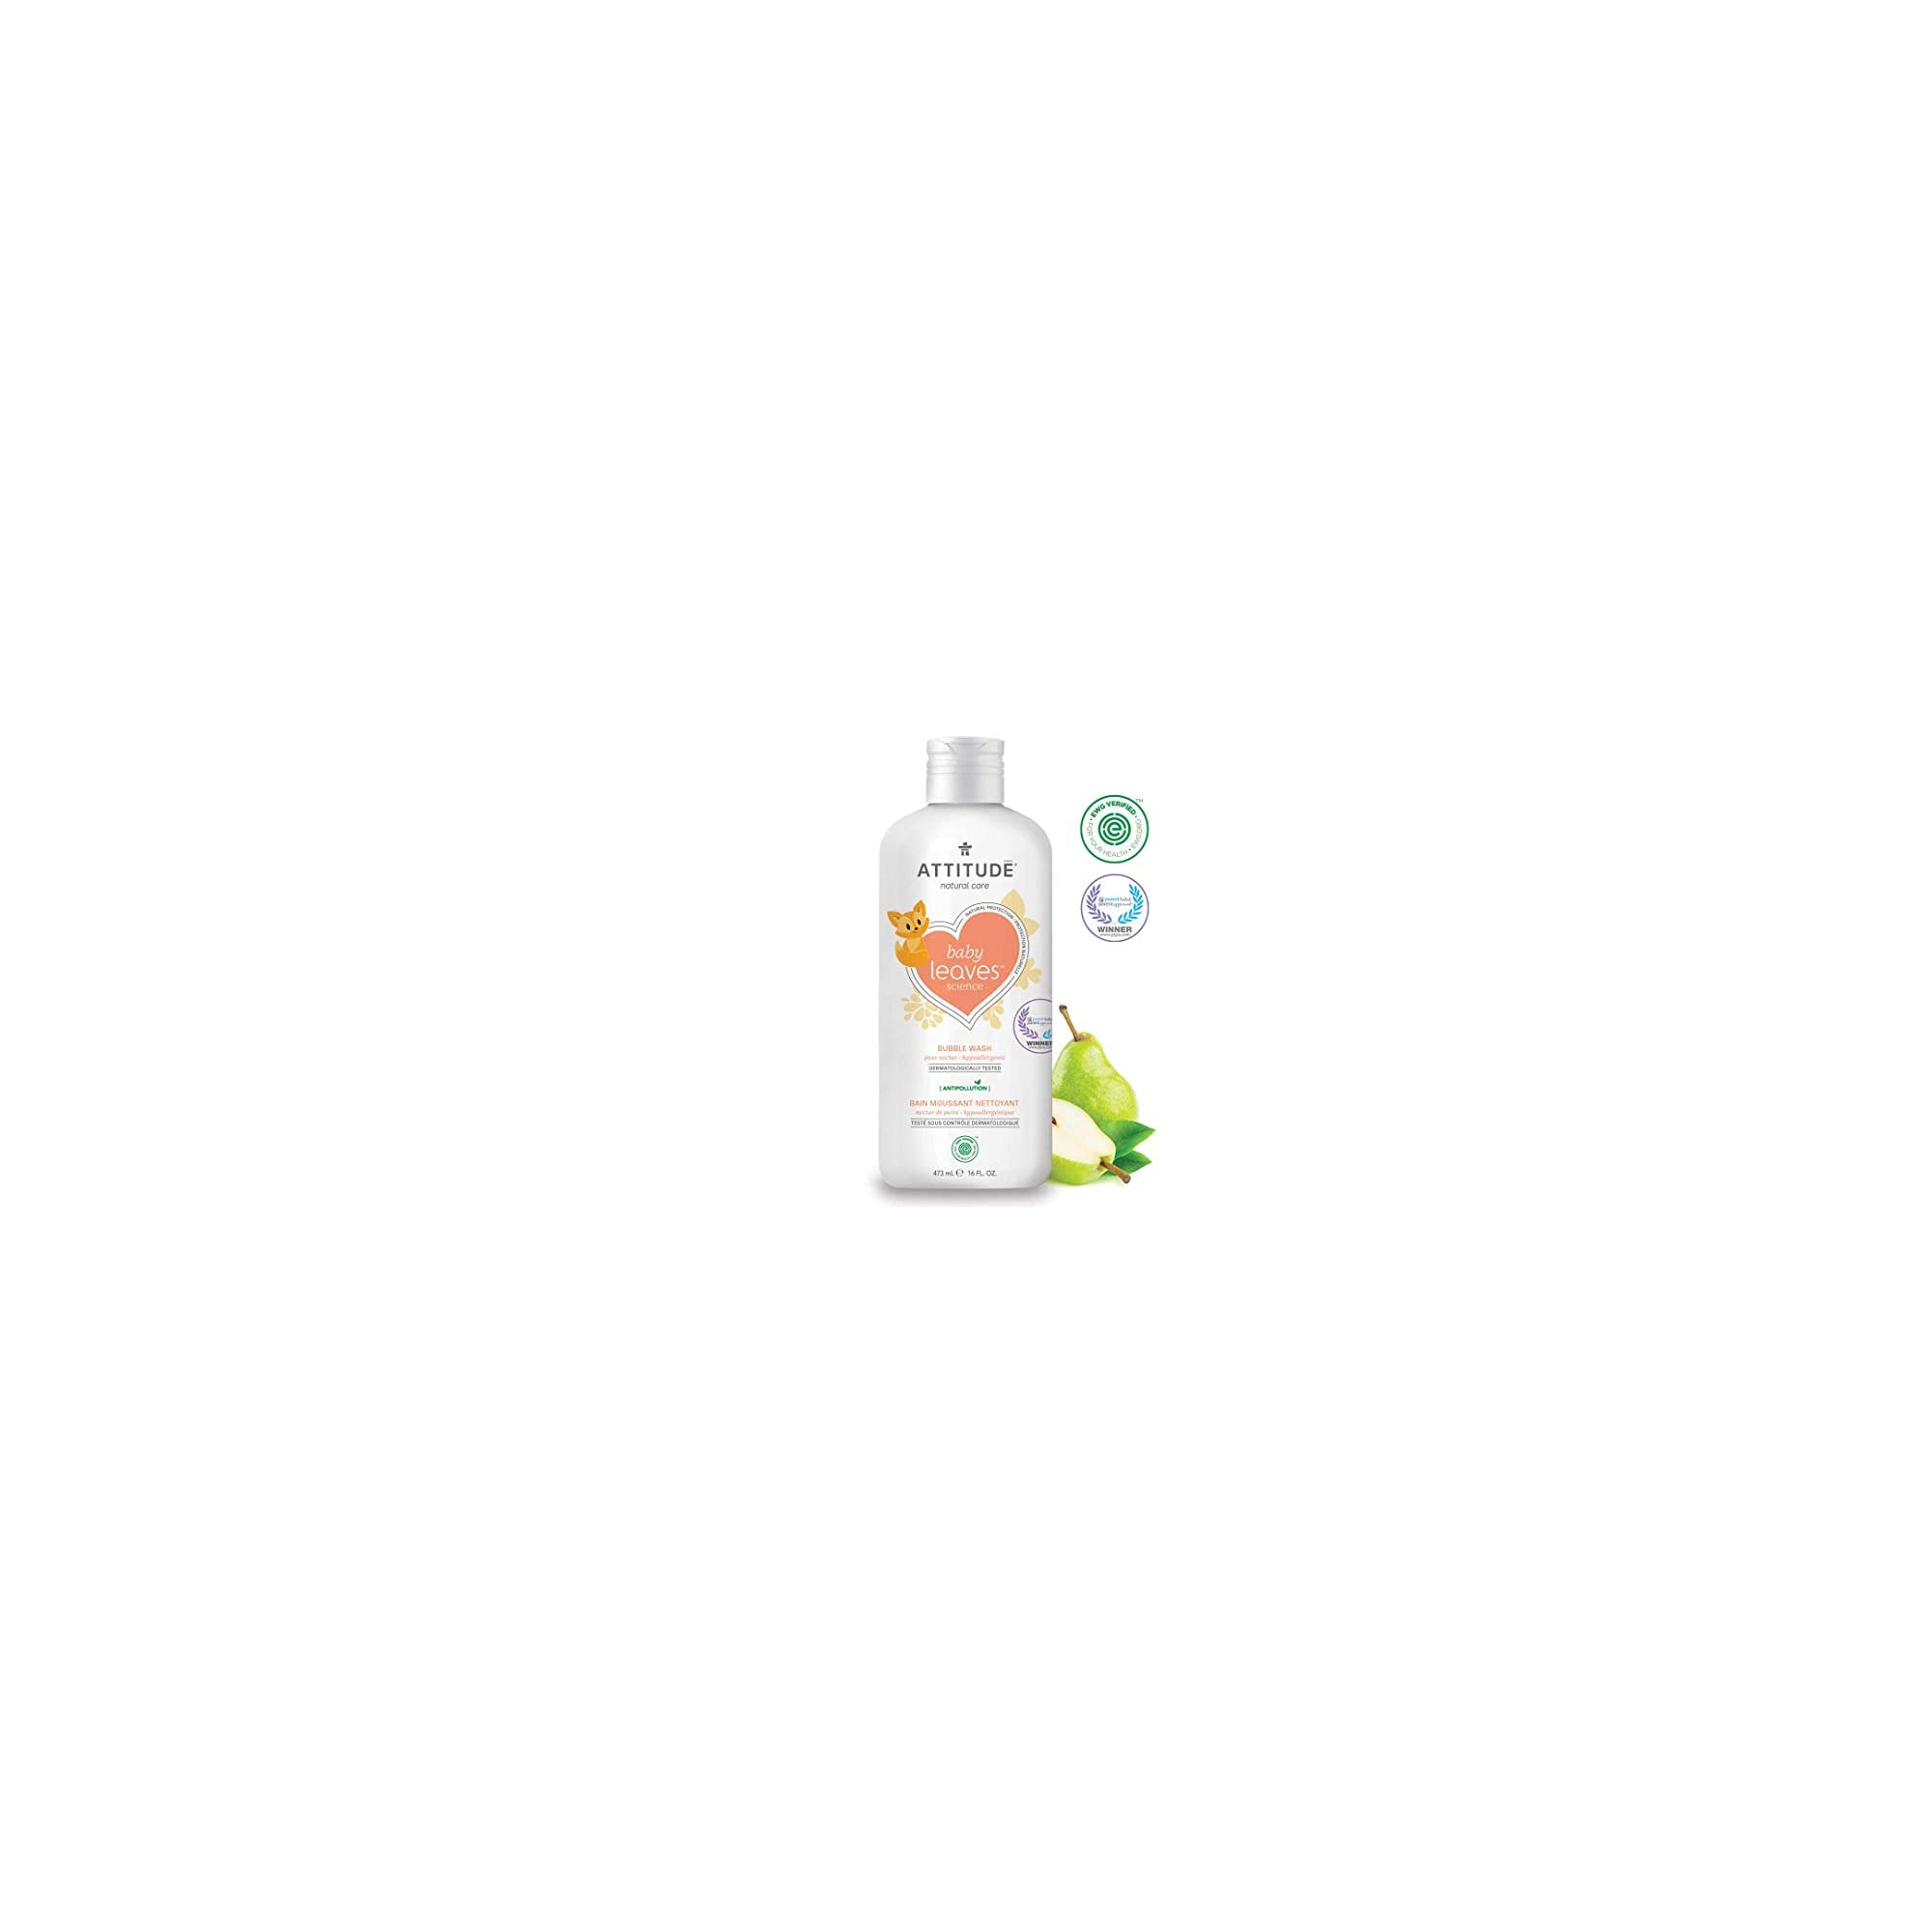 ATTITUDE Natural Baby Bubble Wash for Sensitive Skin, EWG Verified, Non-Toxic Hypoallergenic Gentle Eco-Friendly Formula, Pear Nectar, 16 Fl Oz